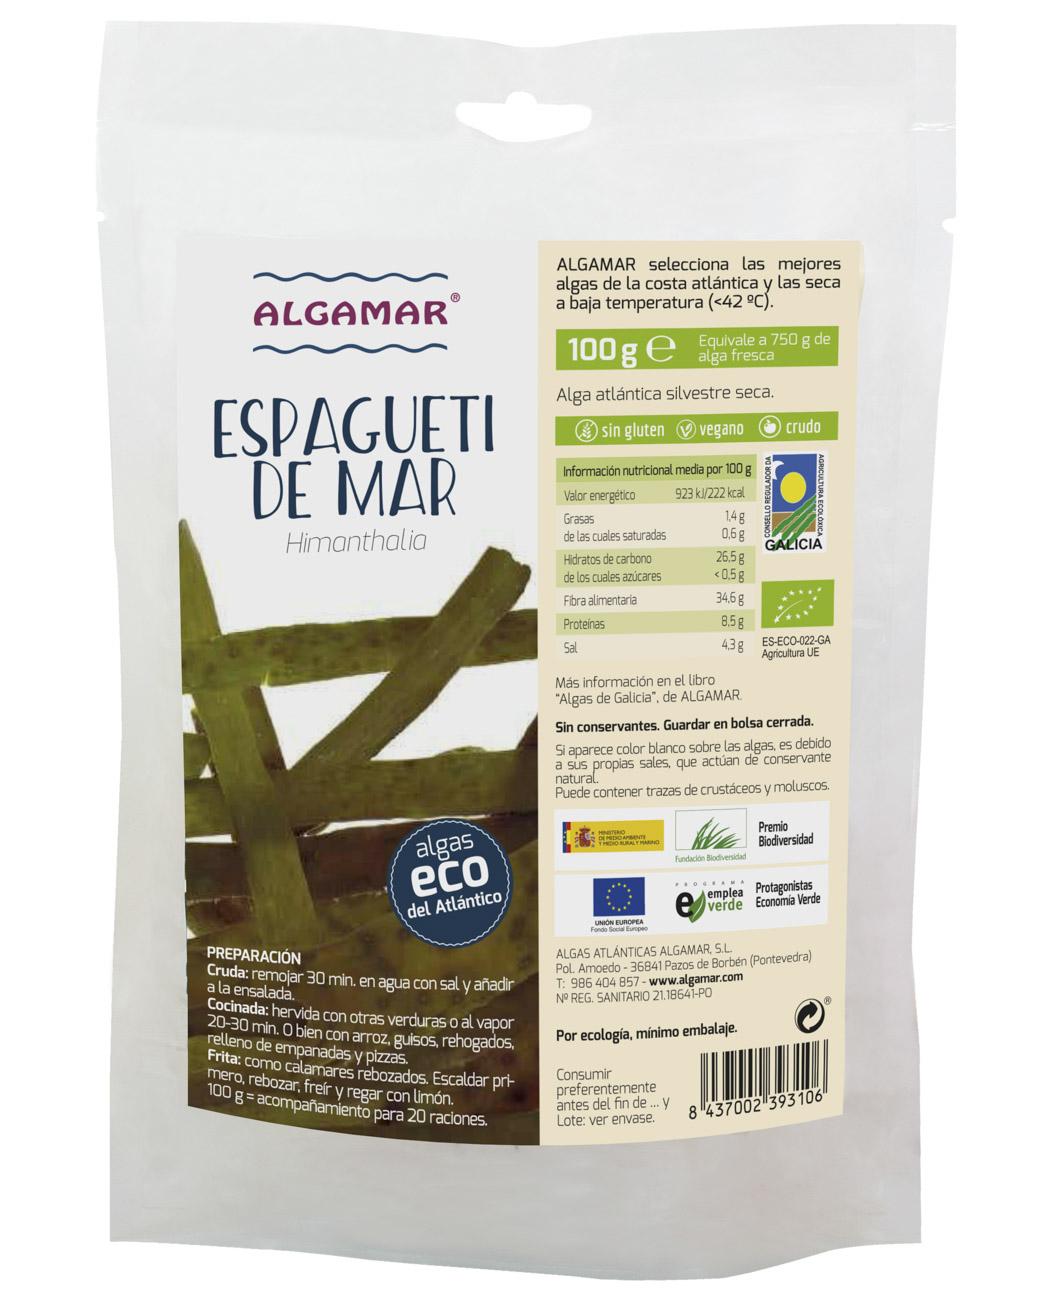 07-algamar-espagueti-de-mar-100g